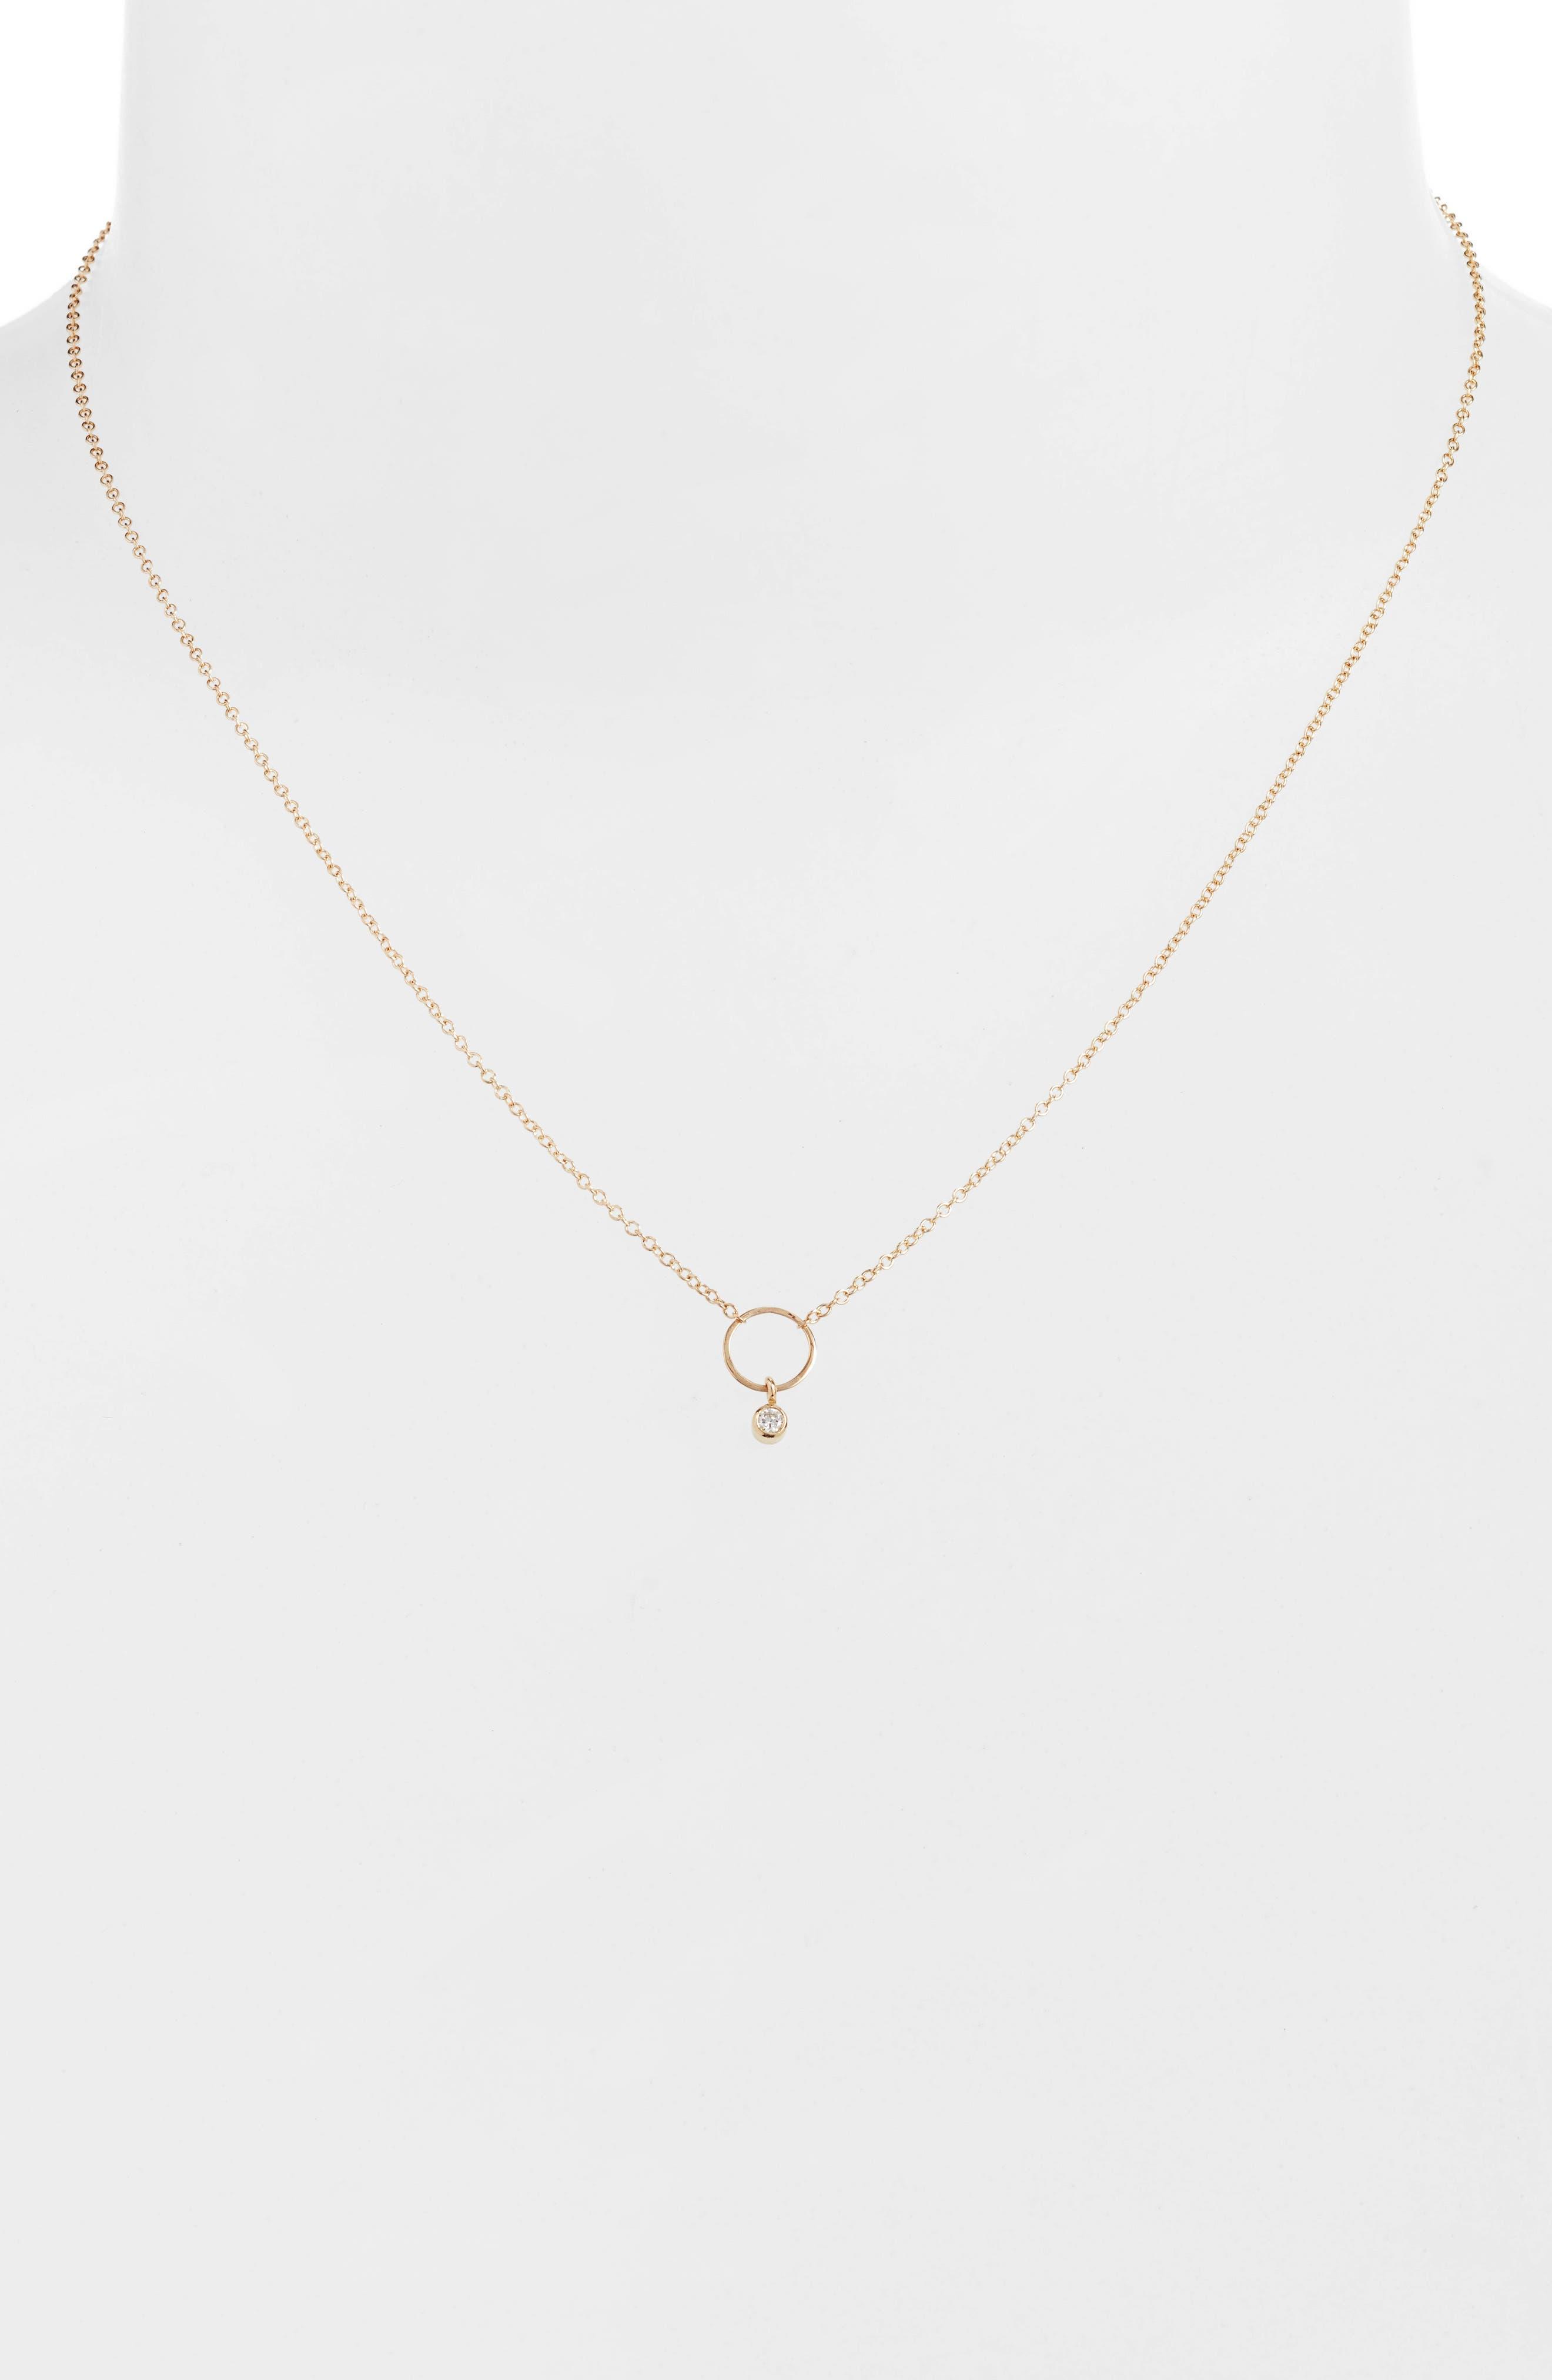 Dangling Diamond Circle Pendant Necklace,                             Alternate thumbnail 2, color,                             YELLOW GOLD